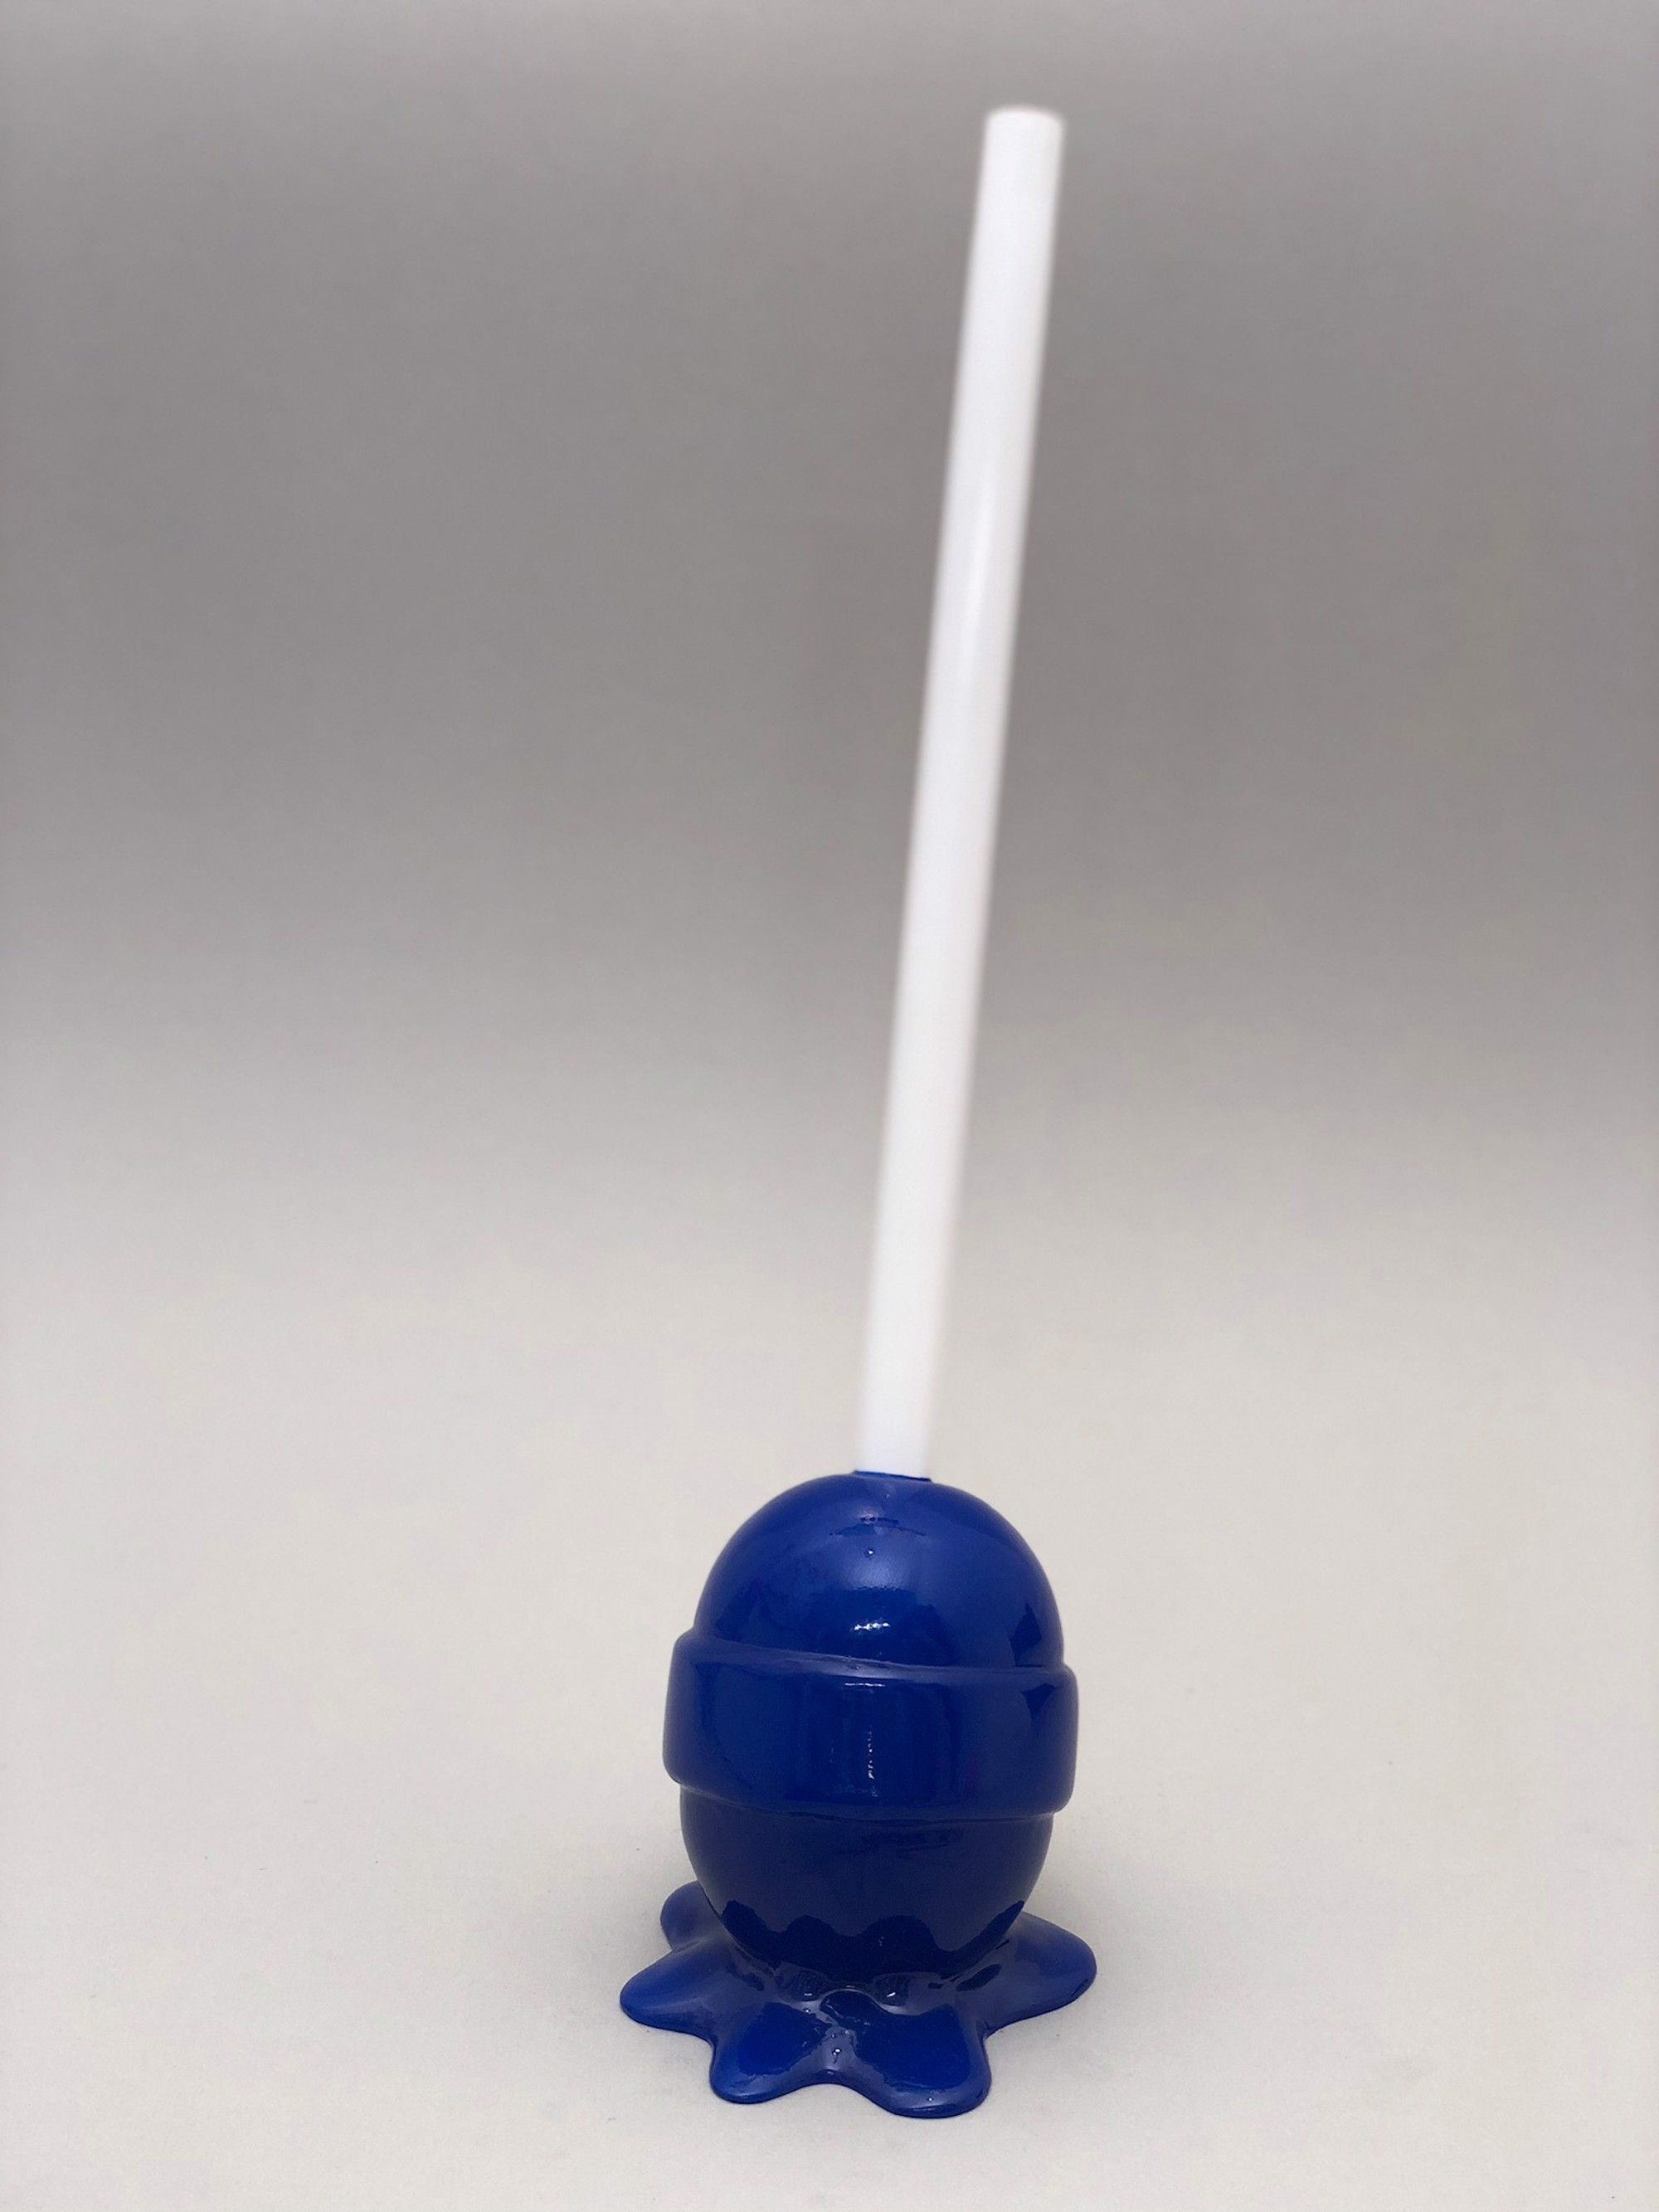 The Sweet Life, small, blue Lollipop by Elena Bulatova